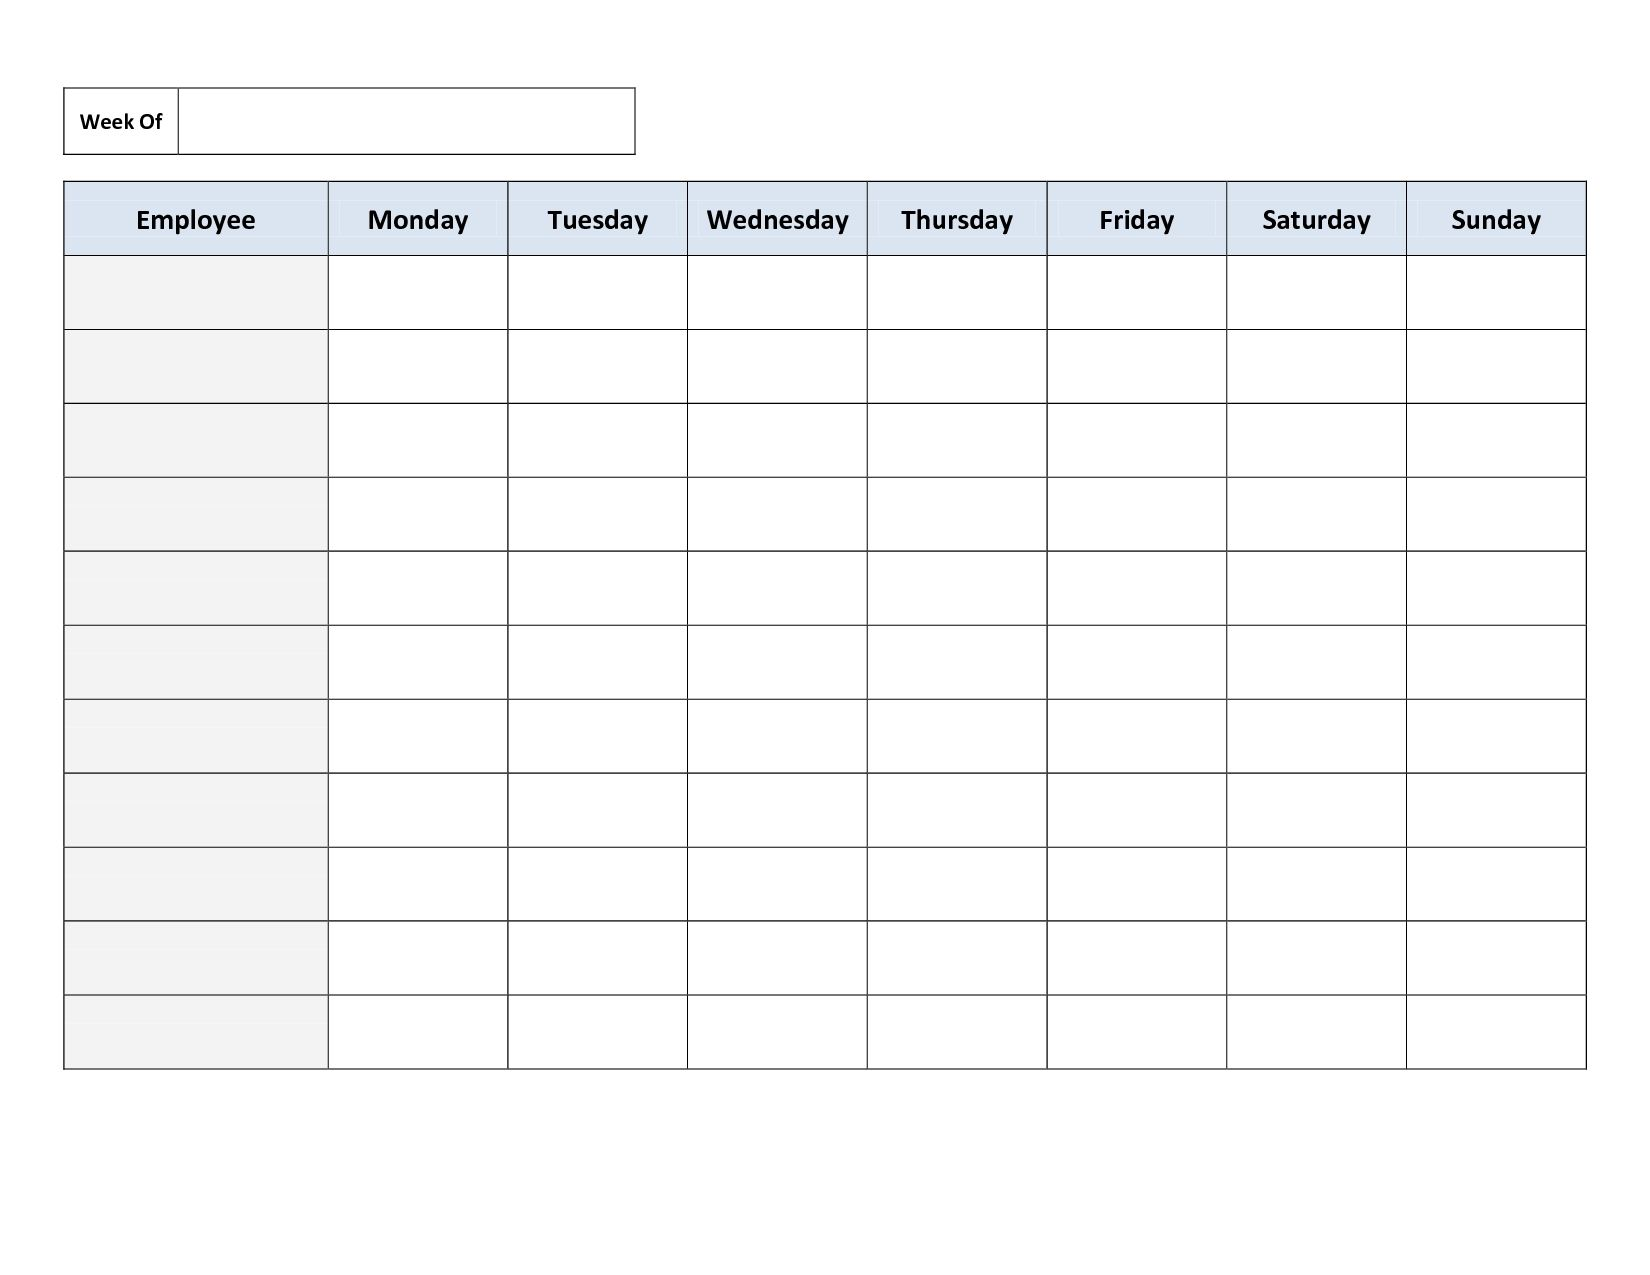 Weekly Employee Work Schedule Template Free Blank Schedule Pdf Get Cleaning Schedule Templates Schedule Templates Daily Schedule Template Employee work schedule template pdf